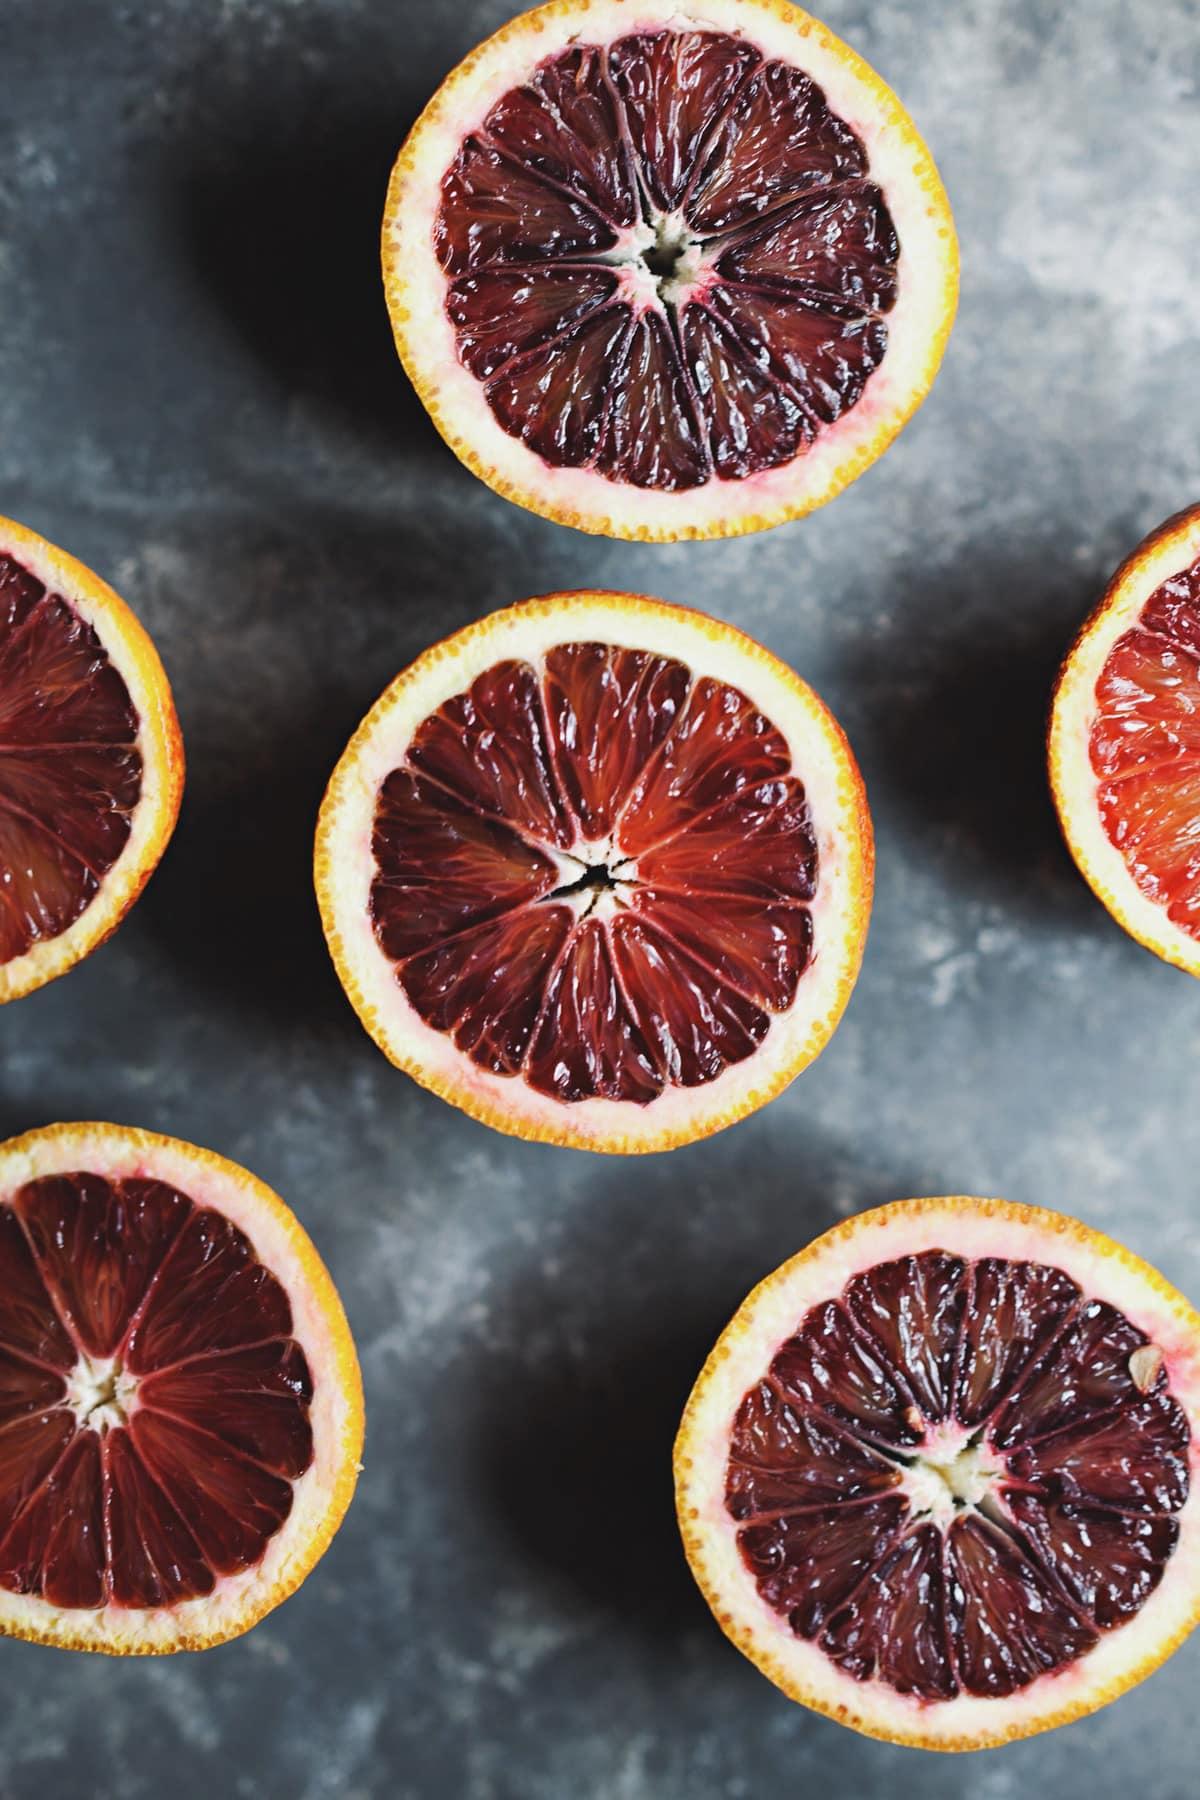 blood oranges cut in half on gray background.